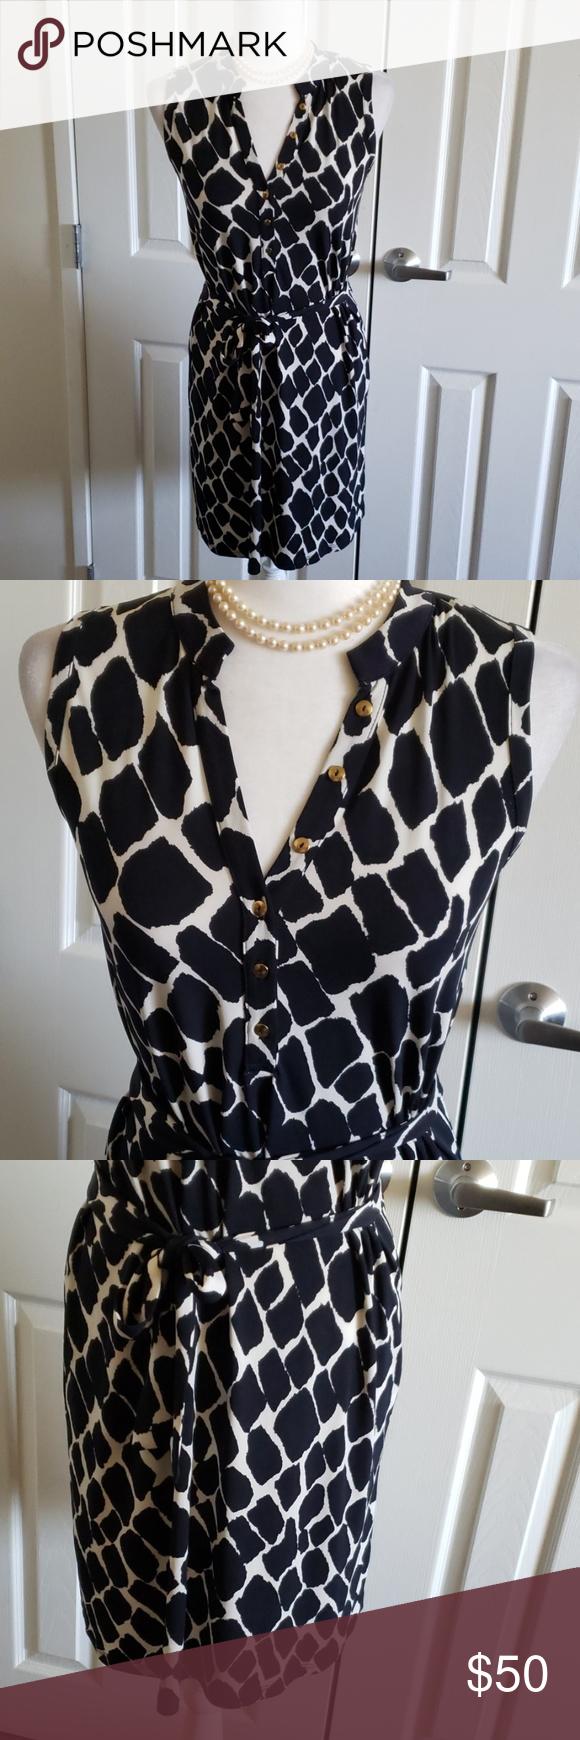 Daniel Cremieux Black White Dress W Gold Trim Xs White Dress Black White Dress Dresses [ 1740 x 580 Pixel ]